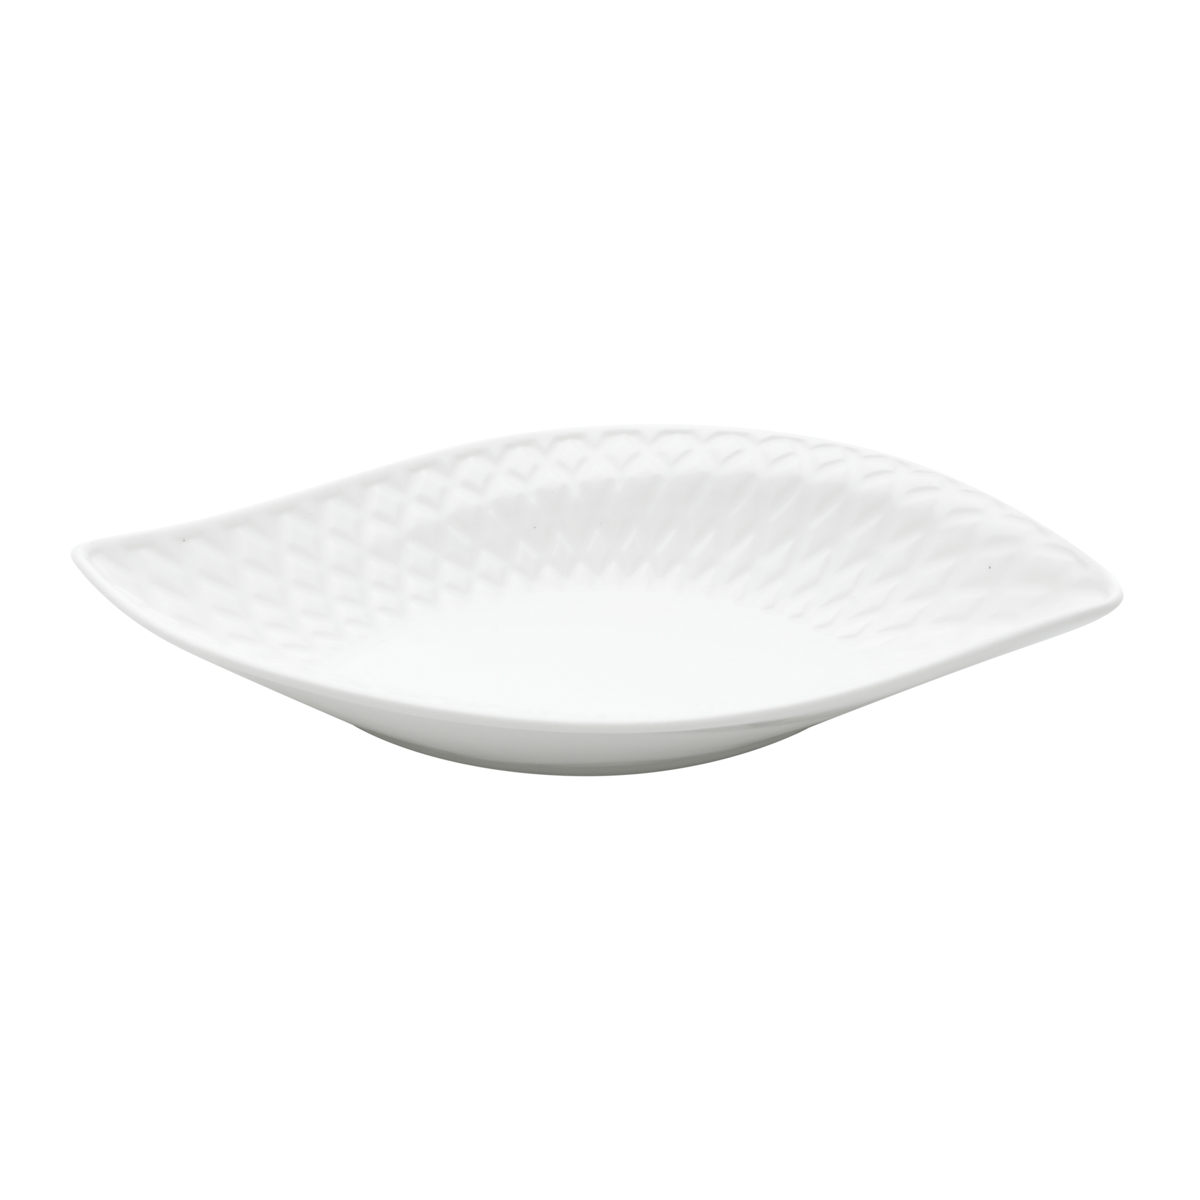 Petisqueira cerâmica Curvy Leaf Branco 20x10x3 cm Urban